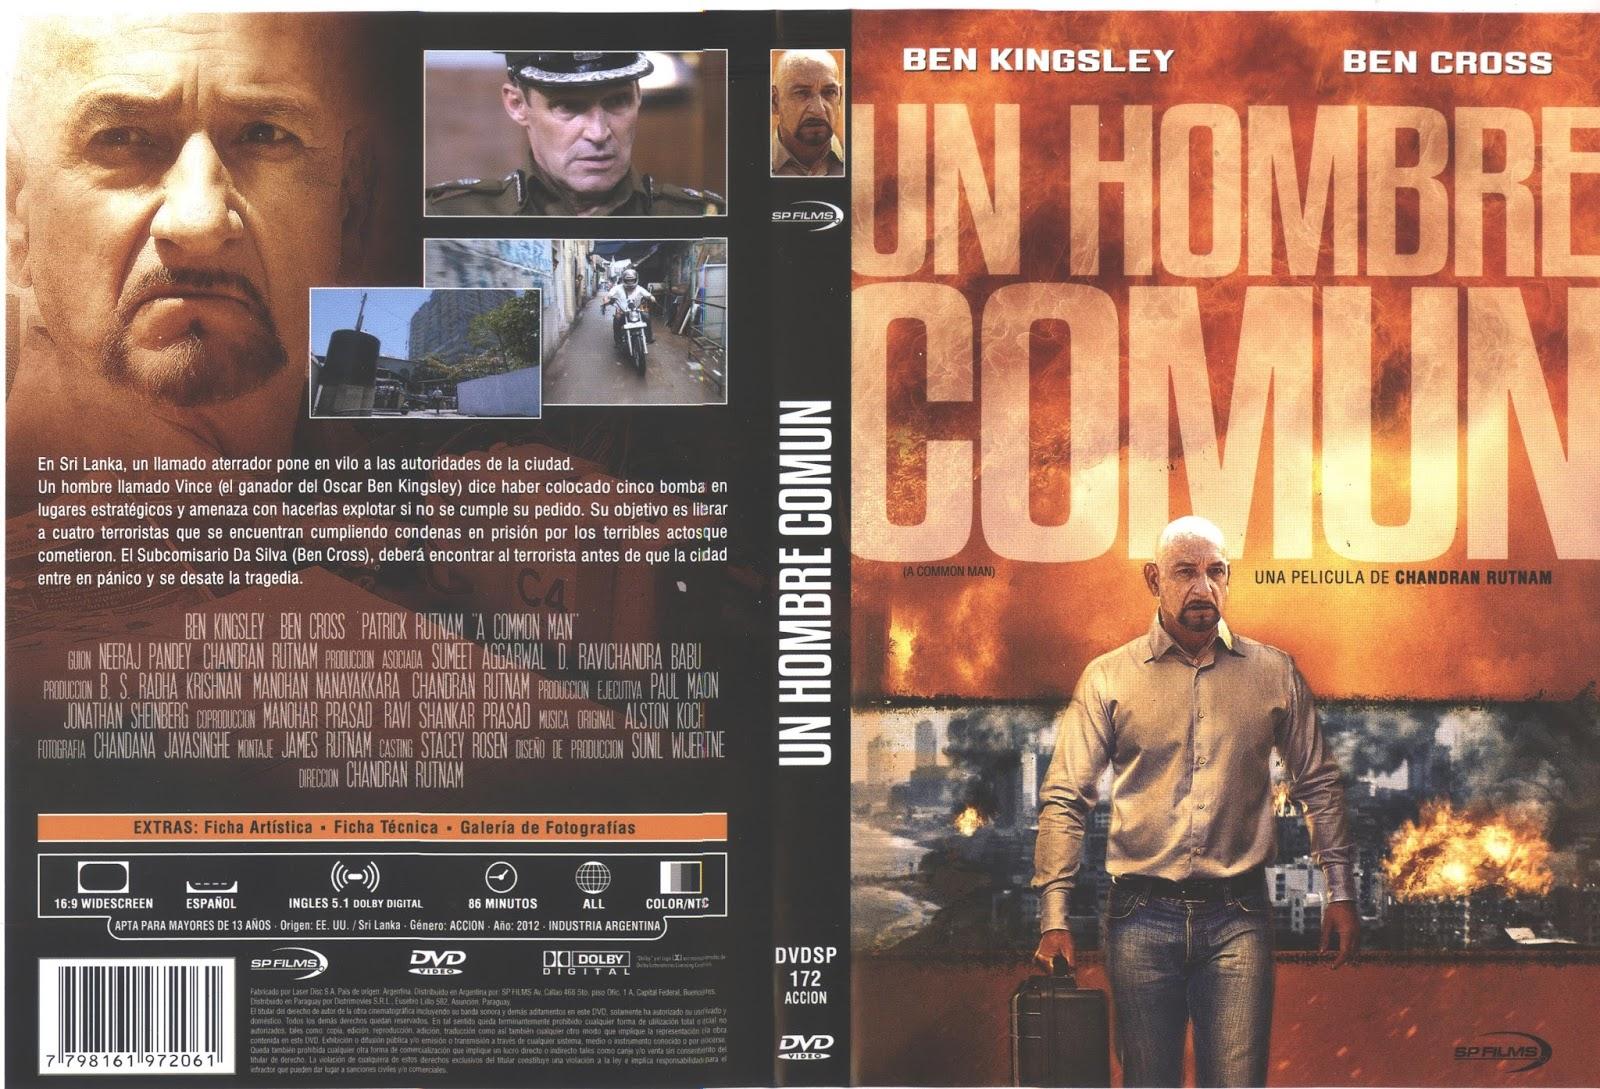 PB | DVD Cover / Caratula FREE: A COMMON MAN - DVD COVER 2012 A Common Man Dvd